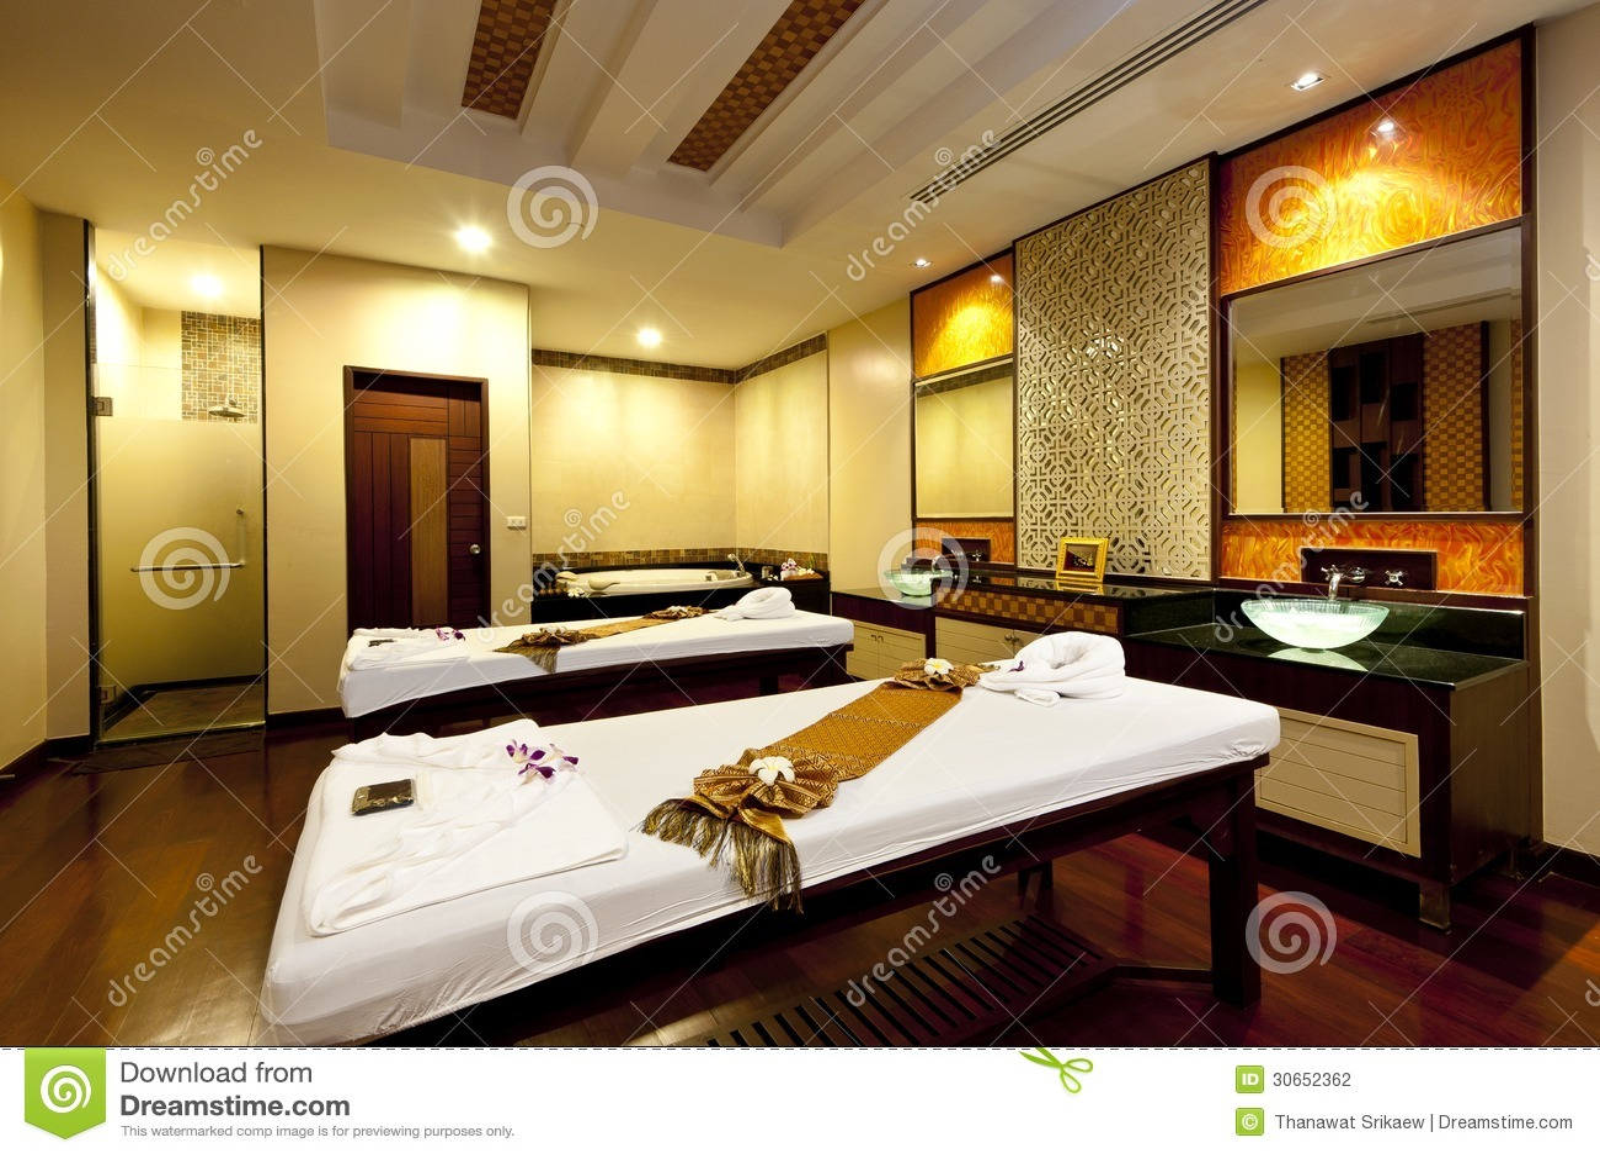 Free hd massage rooms